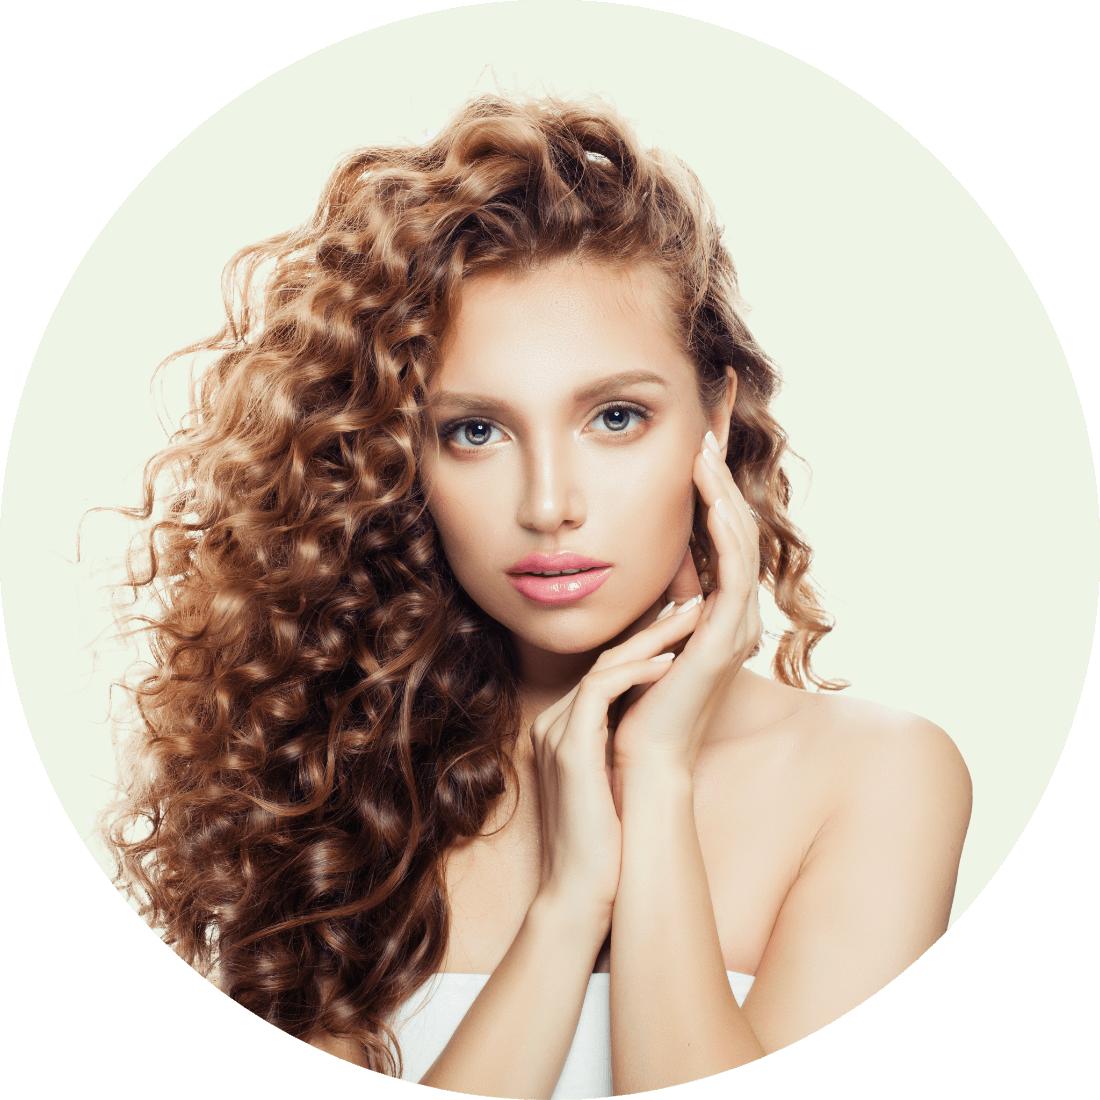 Why women choose Hair Transplantation?